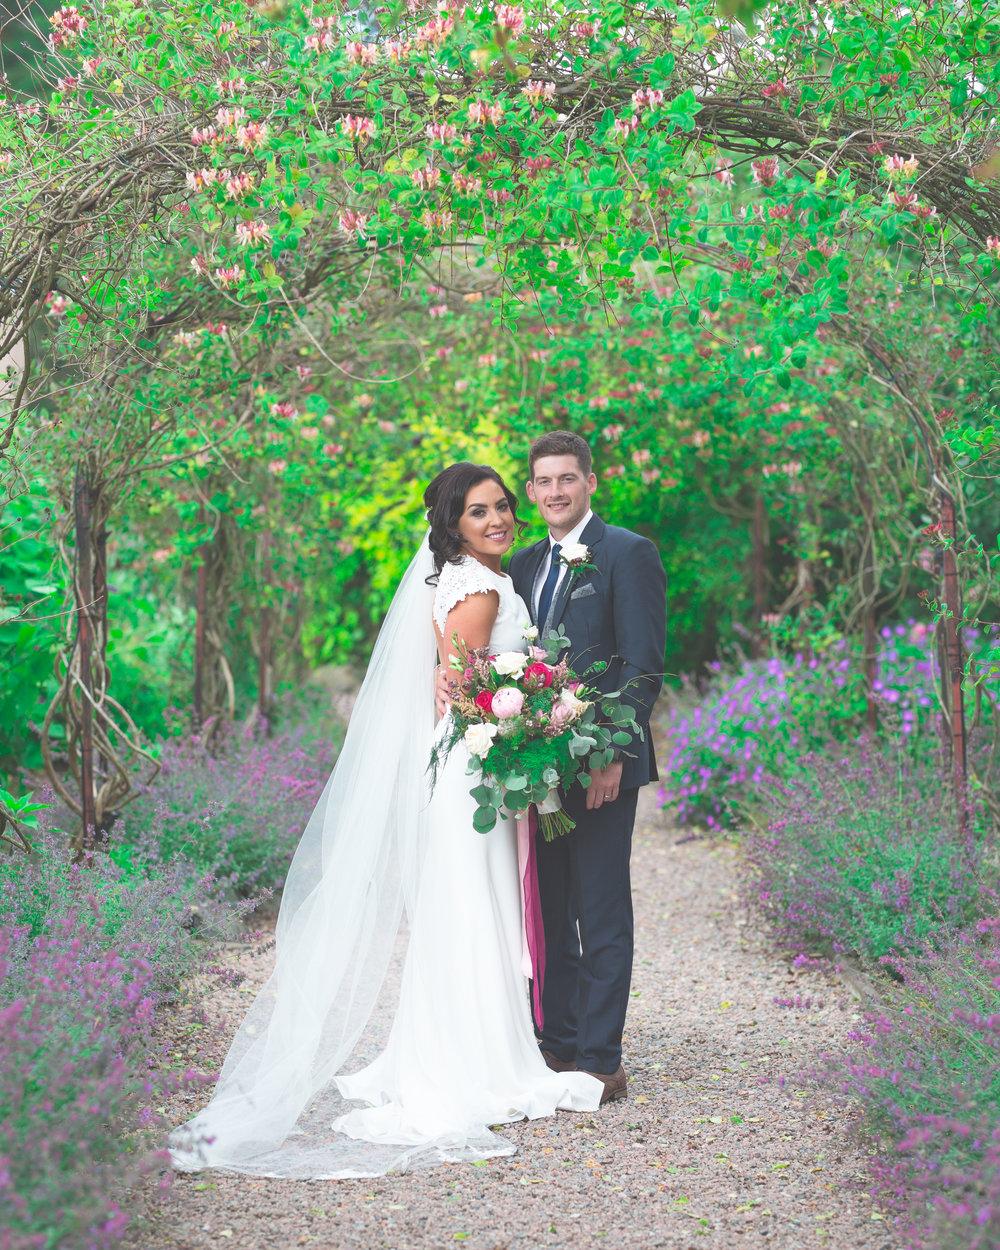 Brian McEwan Wedding Photography | Carol-Anne & Sean | The Portraits-27.jpg